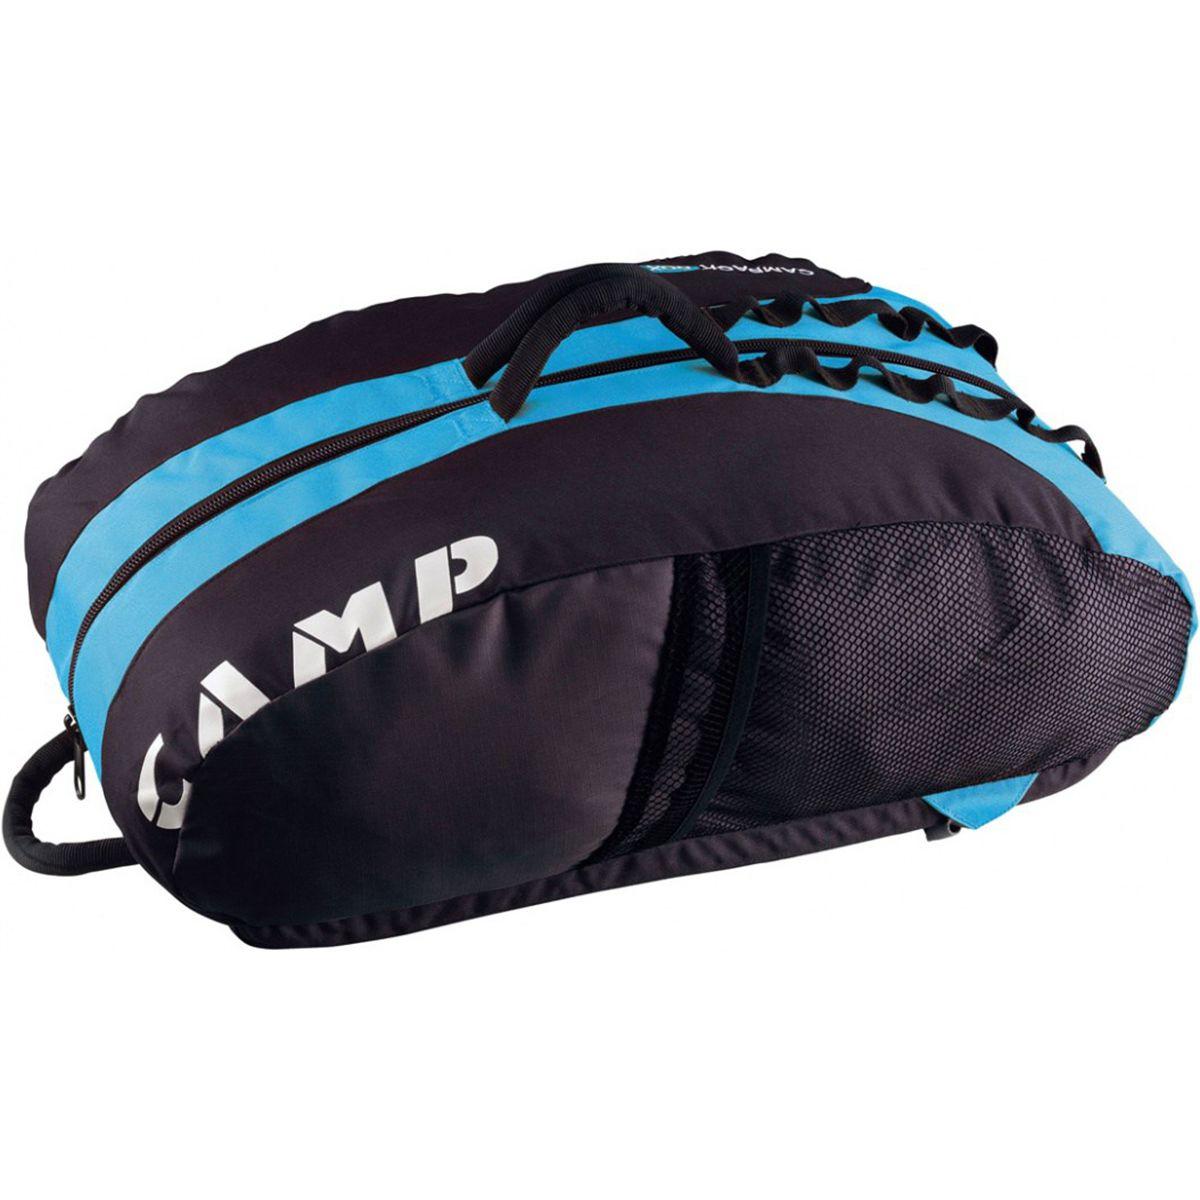 CAMP Rox